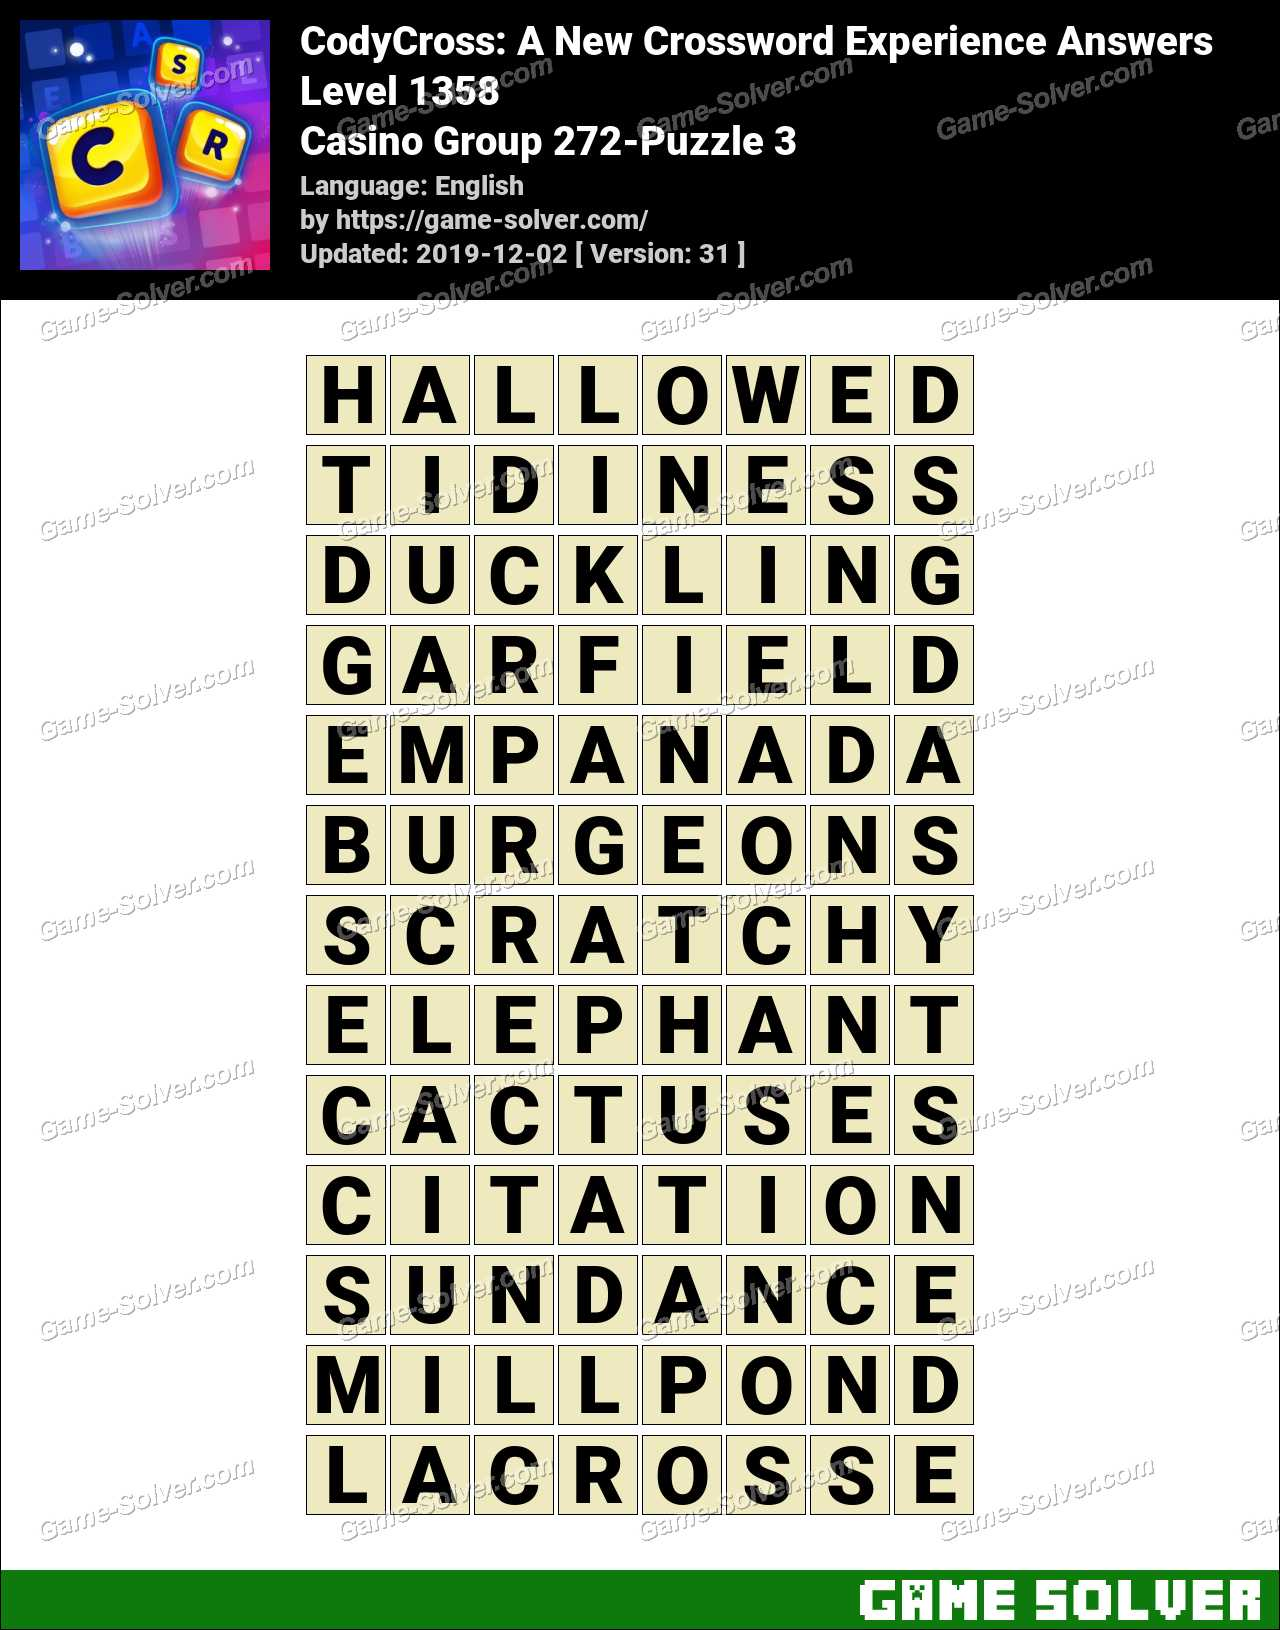 CodyCross Casino Group 272-Puzzle 3 Answers